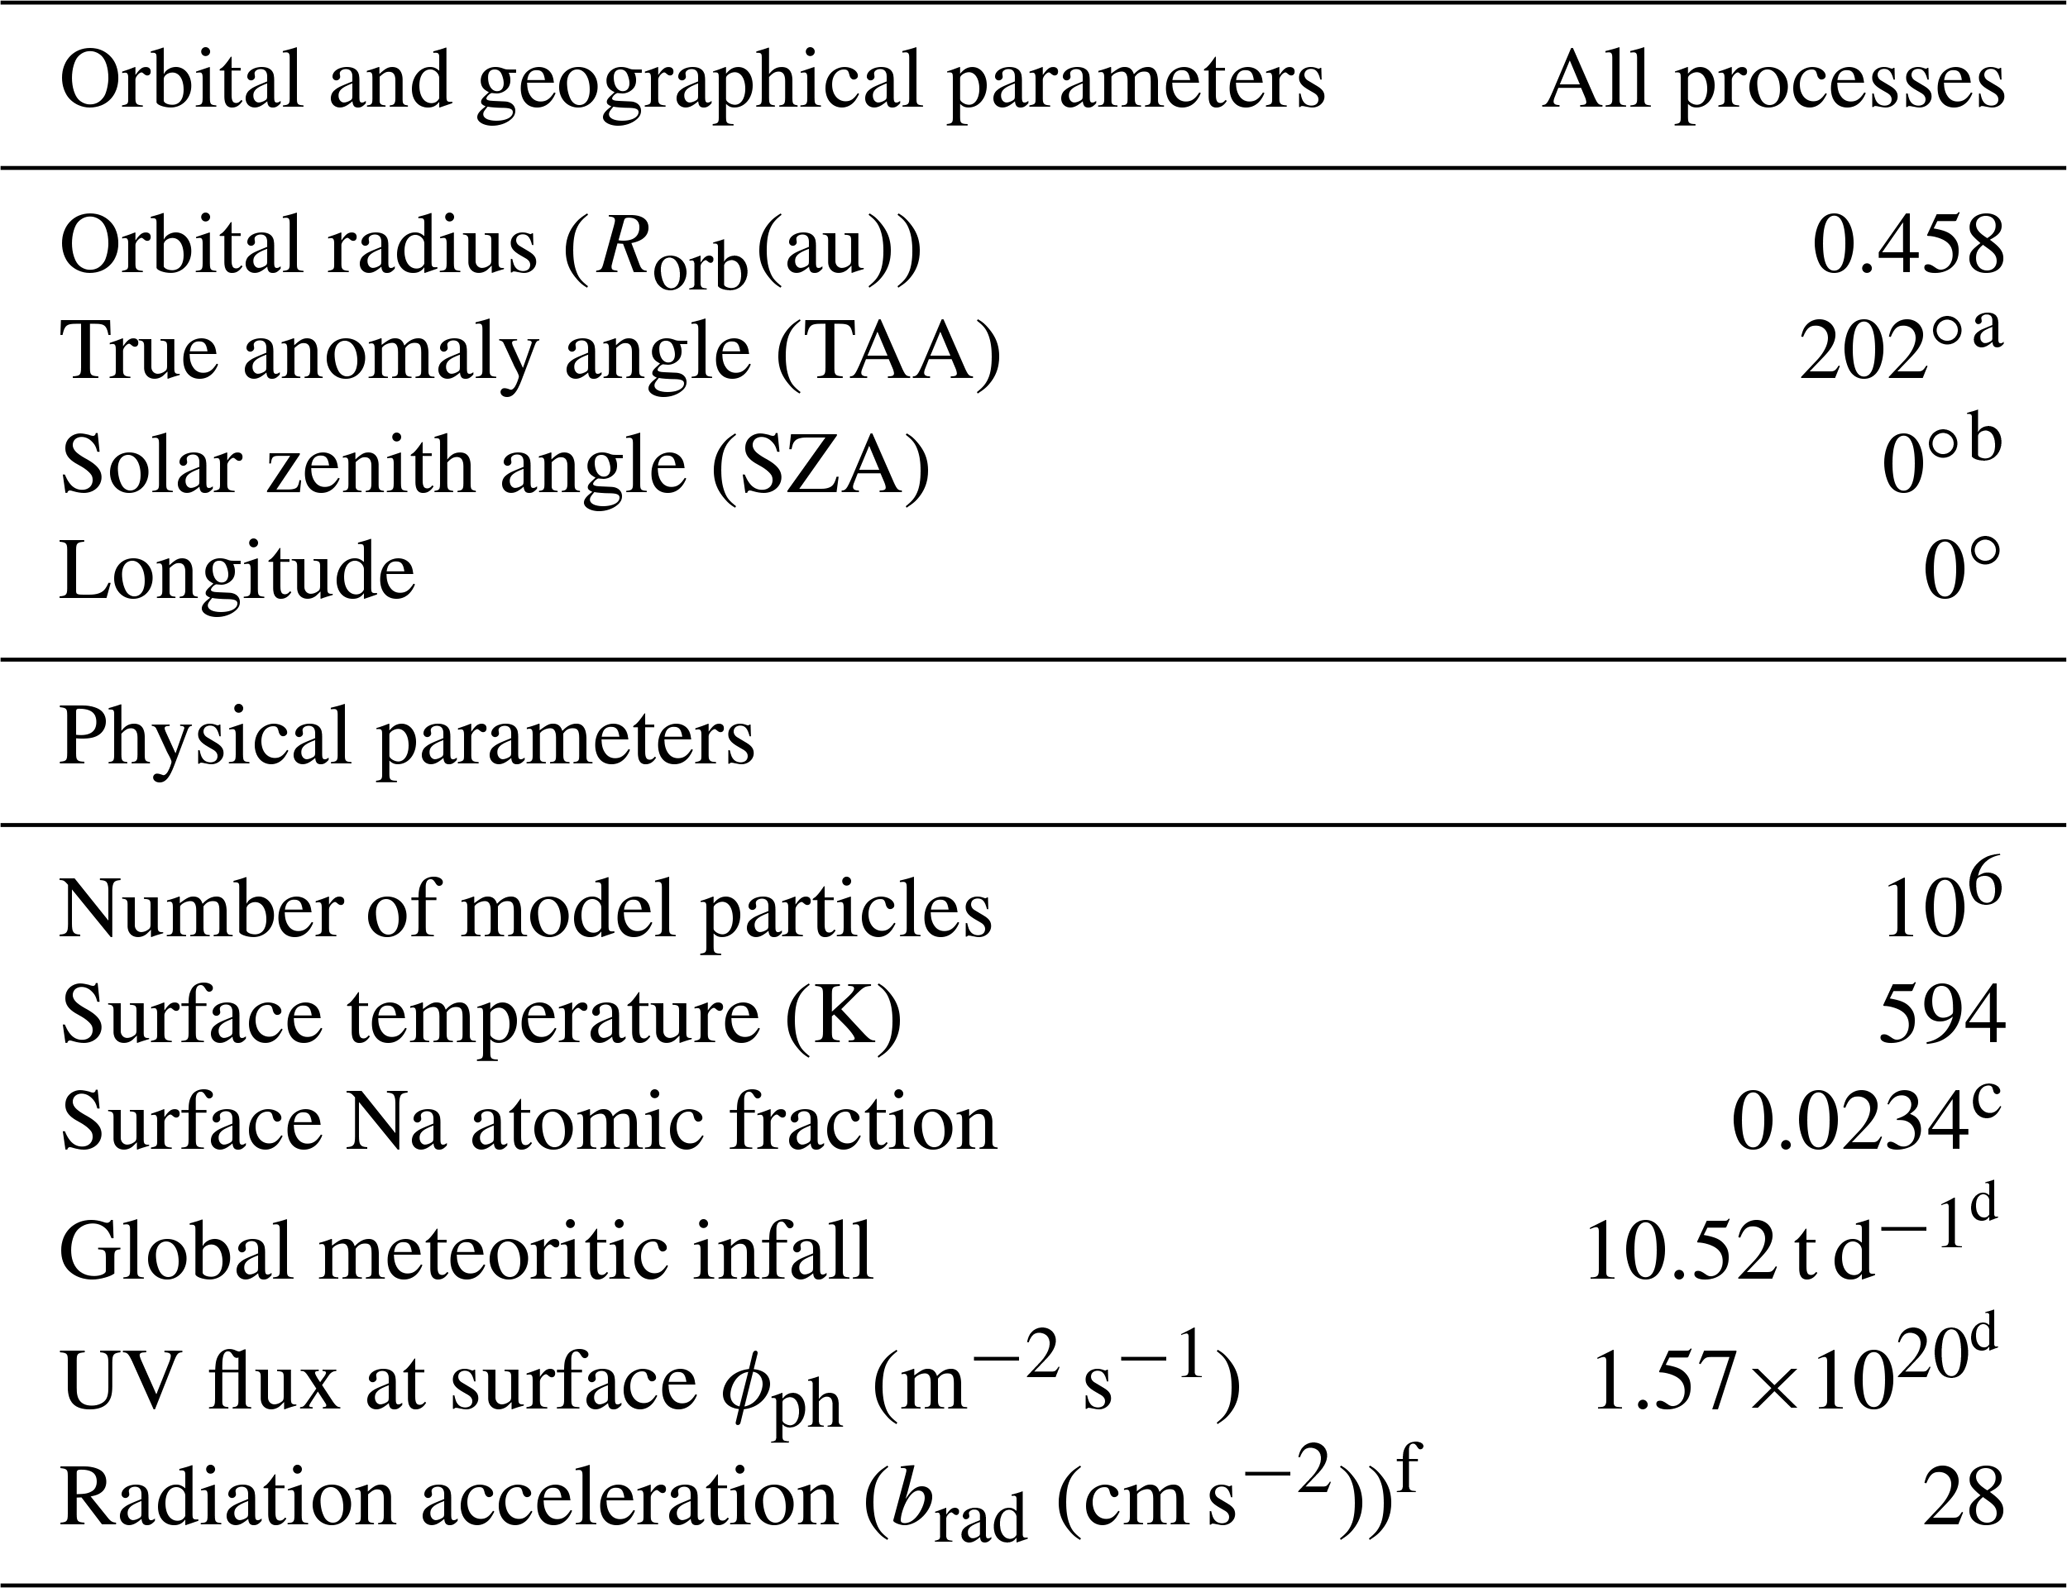 ANGEO - Mercury's subsolar sodium exosphere: an ab initio